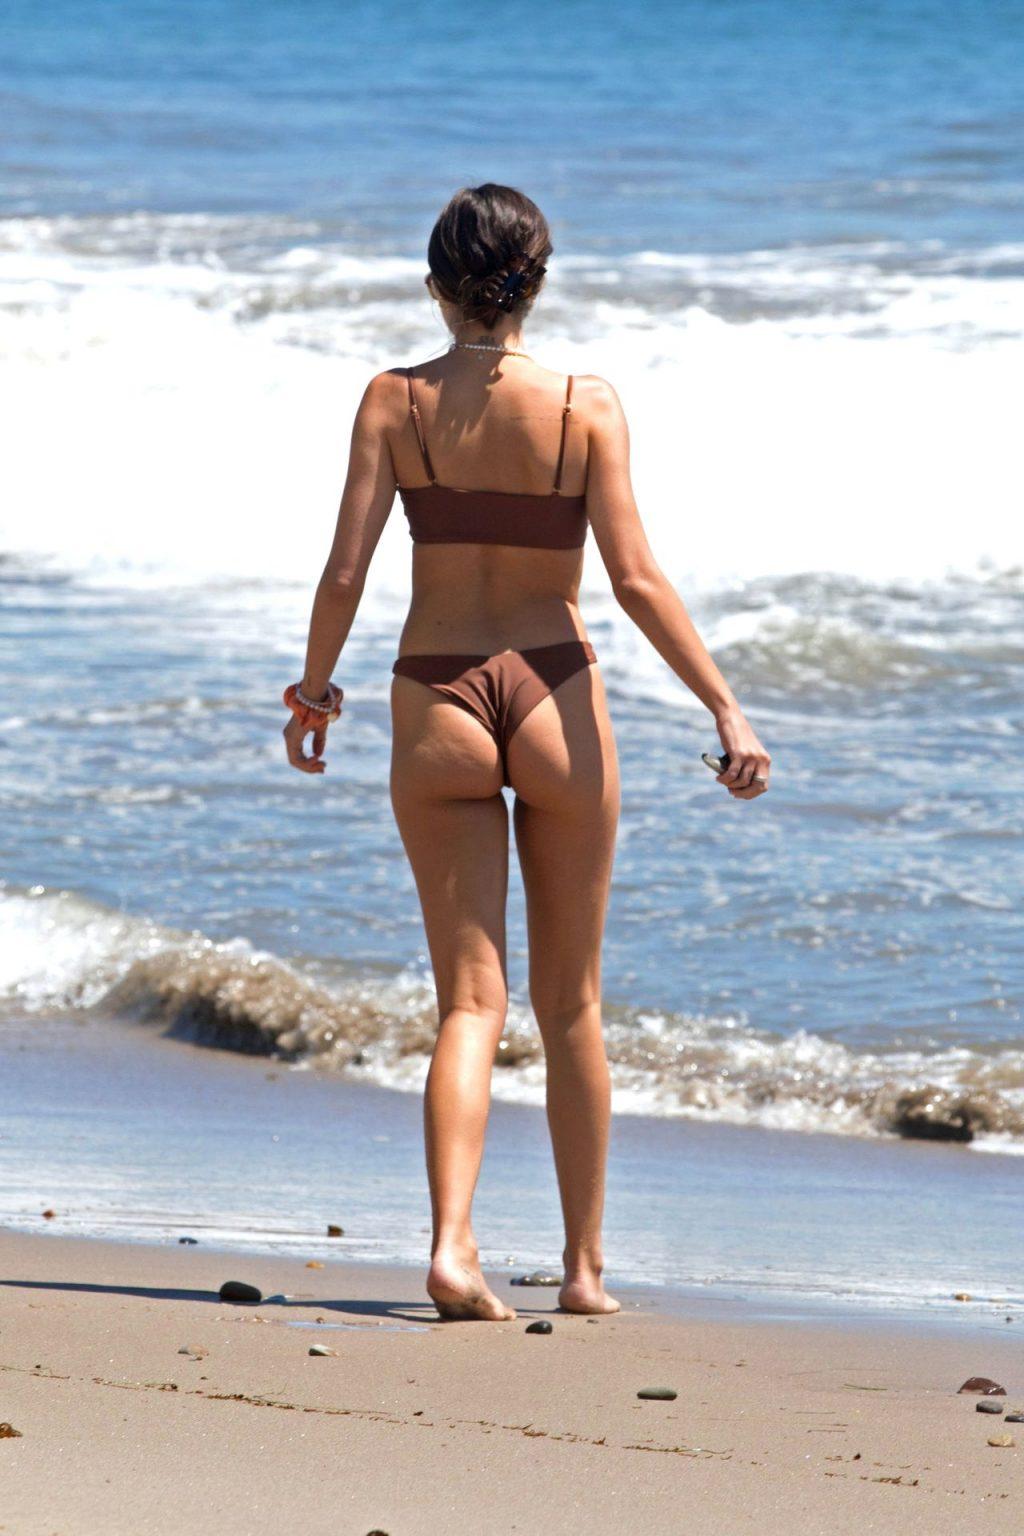 Delilah Belle Hamlin & Amelia Hamlin Show Off Their Bikini Bodies in Malibu (44 Photos)